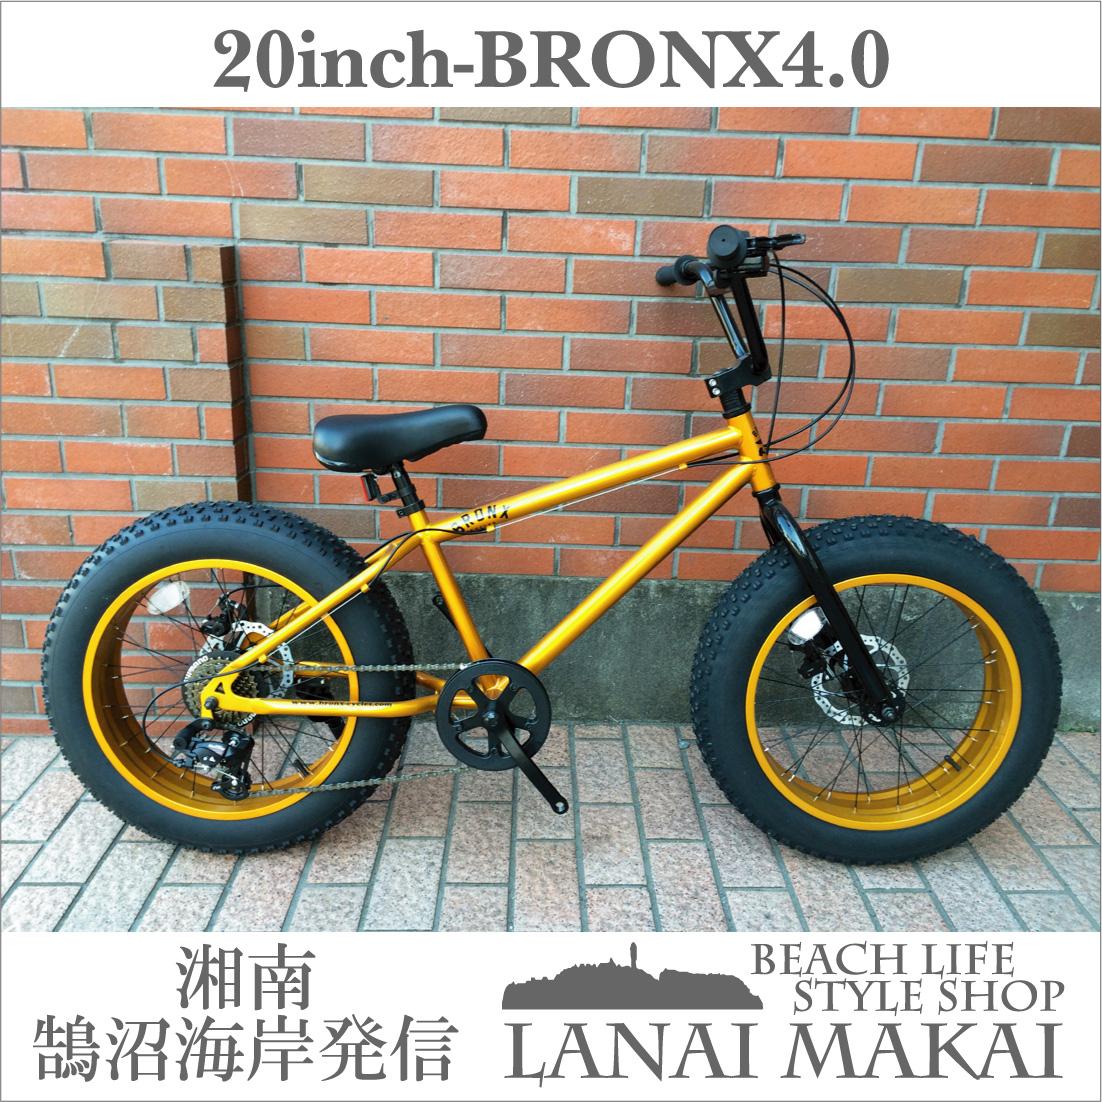 "【MODEL】""BRONX 20nch FAT-BIKES-DD""""変速付き20inchミニベロファットバイク""COLOR:ゴールド×ゴールドリム""湘南鵠沼海岸発信""自転車 ファットバイク メンズ レディース 20インチ 変速付 レインボー BRONX"